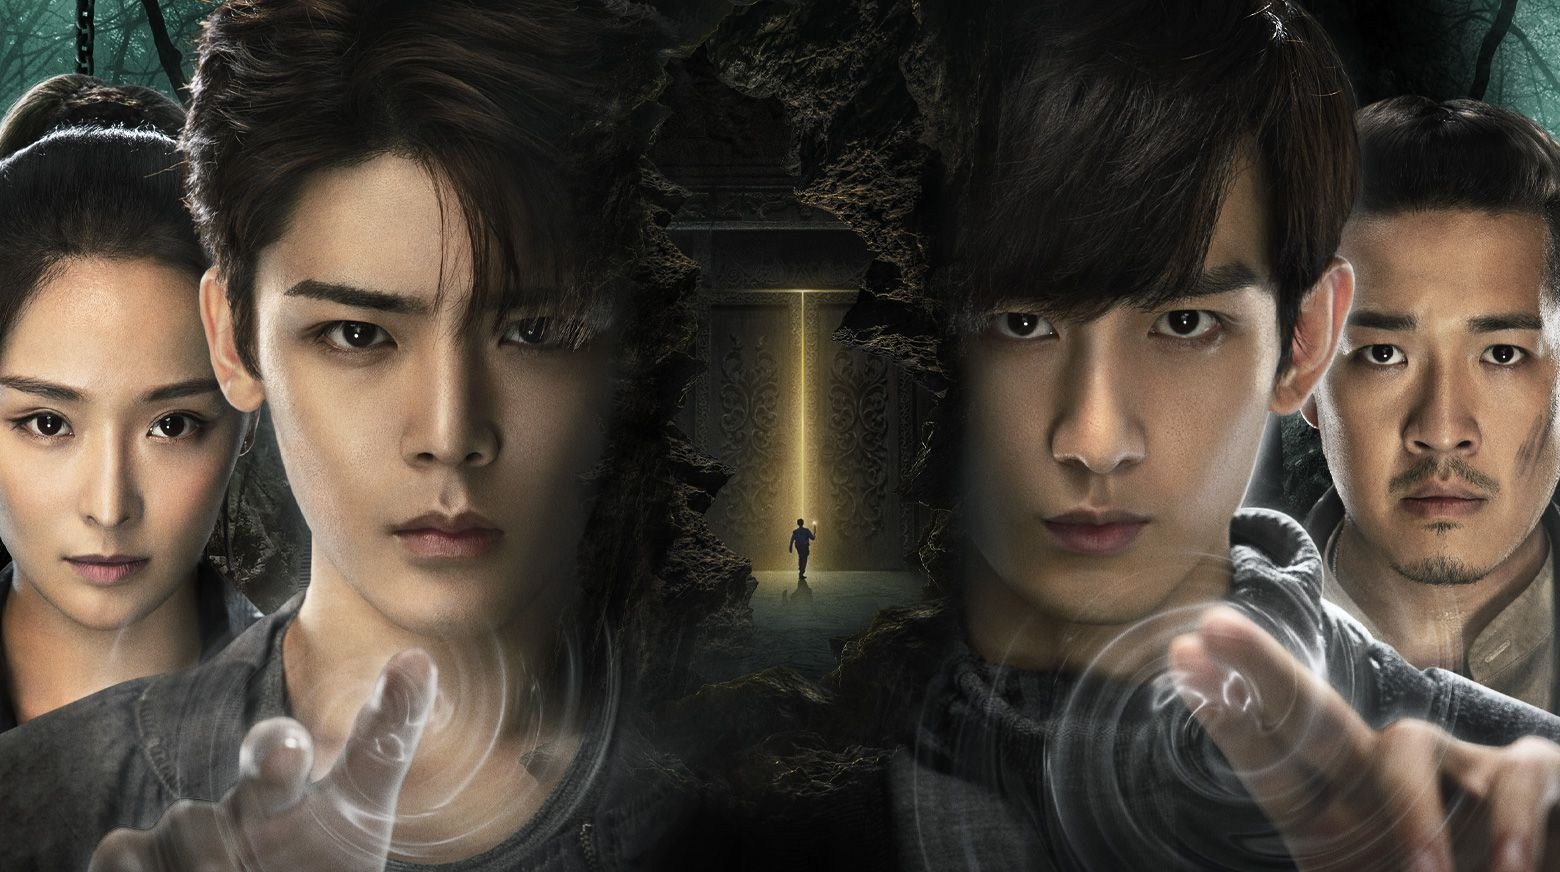 The Lost Tomb 2 Episode 1 - 怒海潜沙&秦岭神树 - Watch Full Episodes